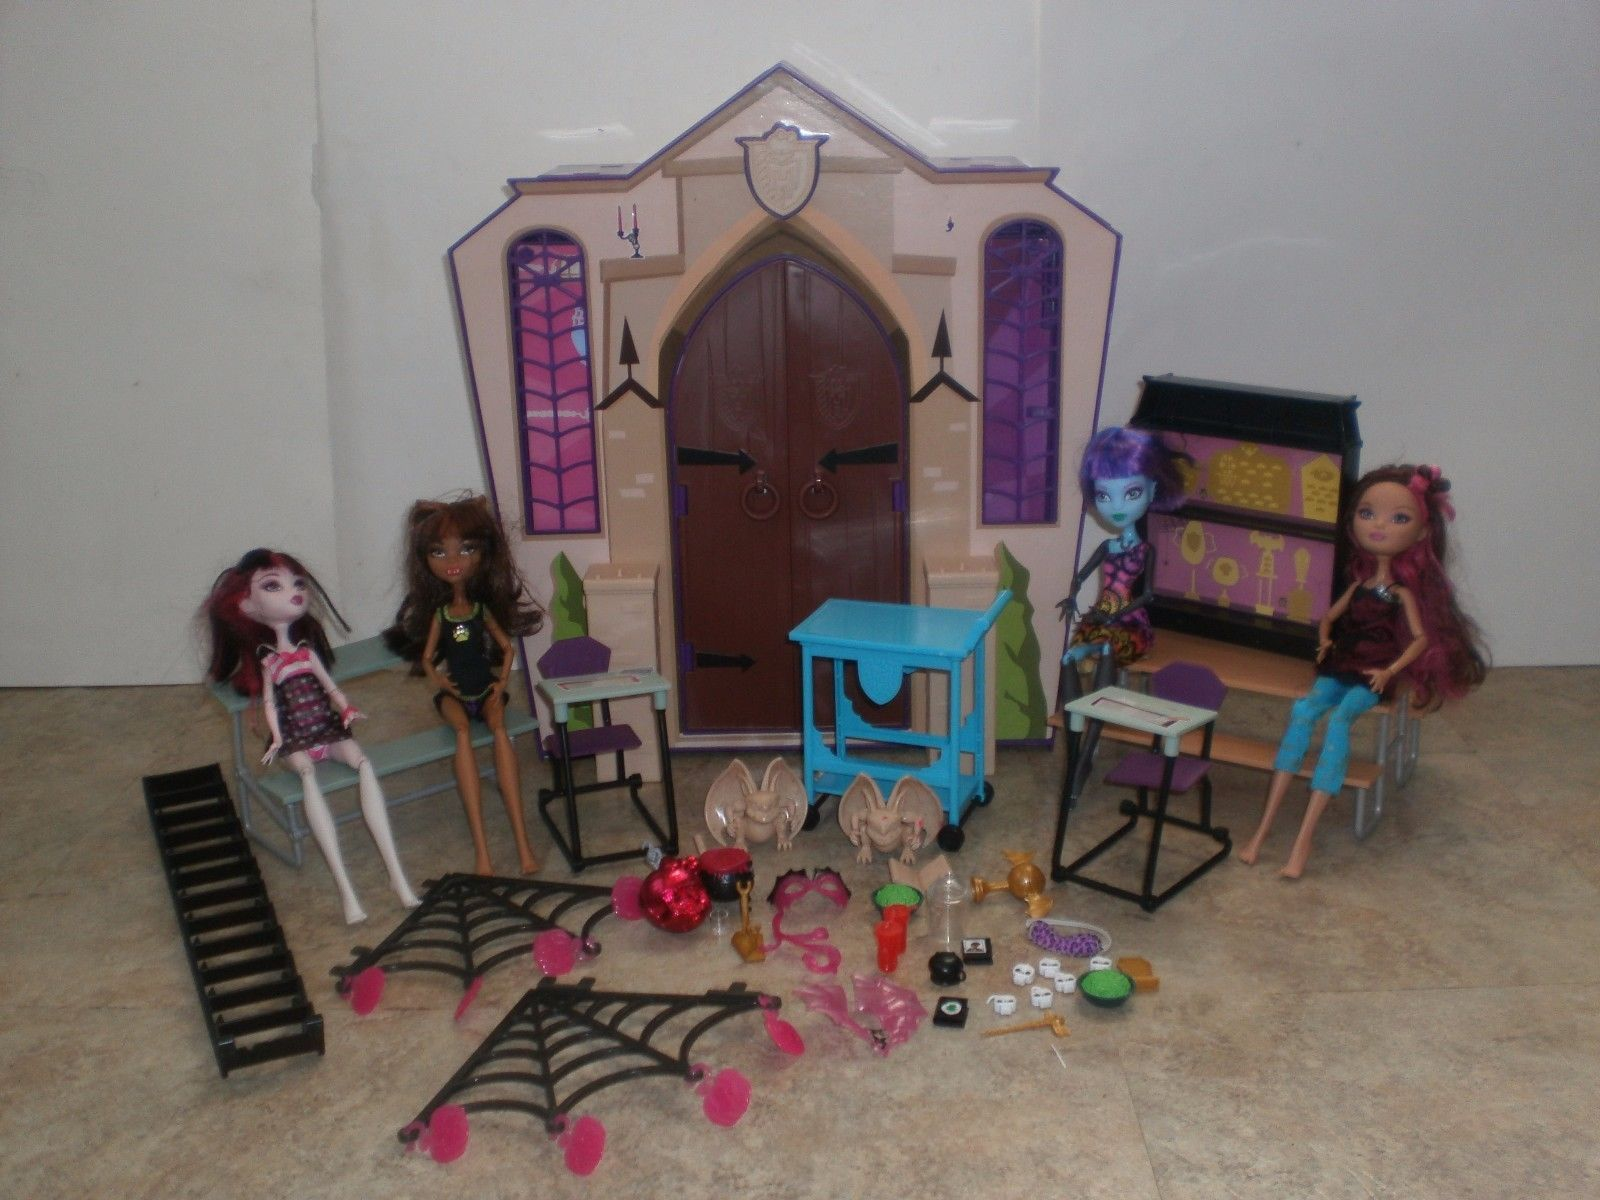 Monster High Ghoul School Portable Dollhouse Playset  4 dolls & accessories https://t.co/MN4Bqdk7QQ https://t.co/MxqwemypvN